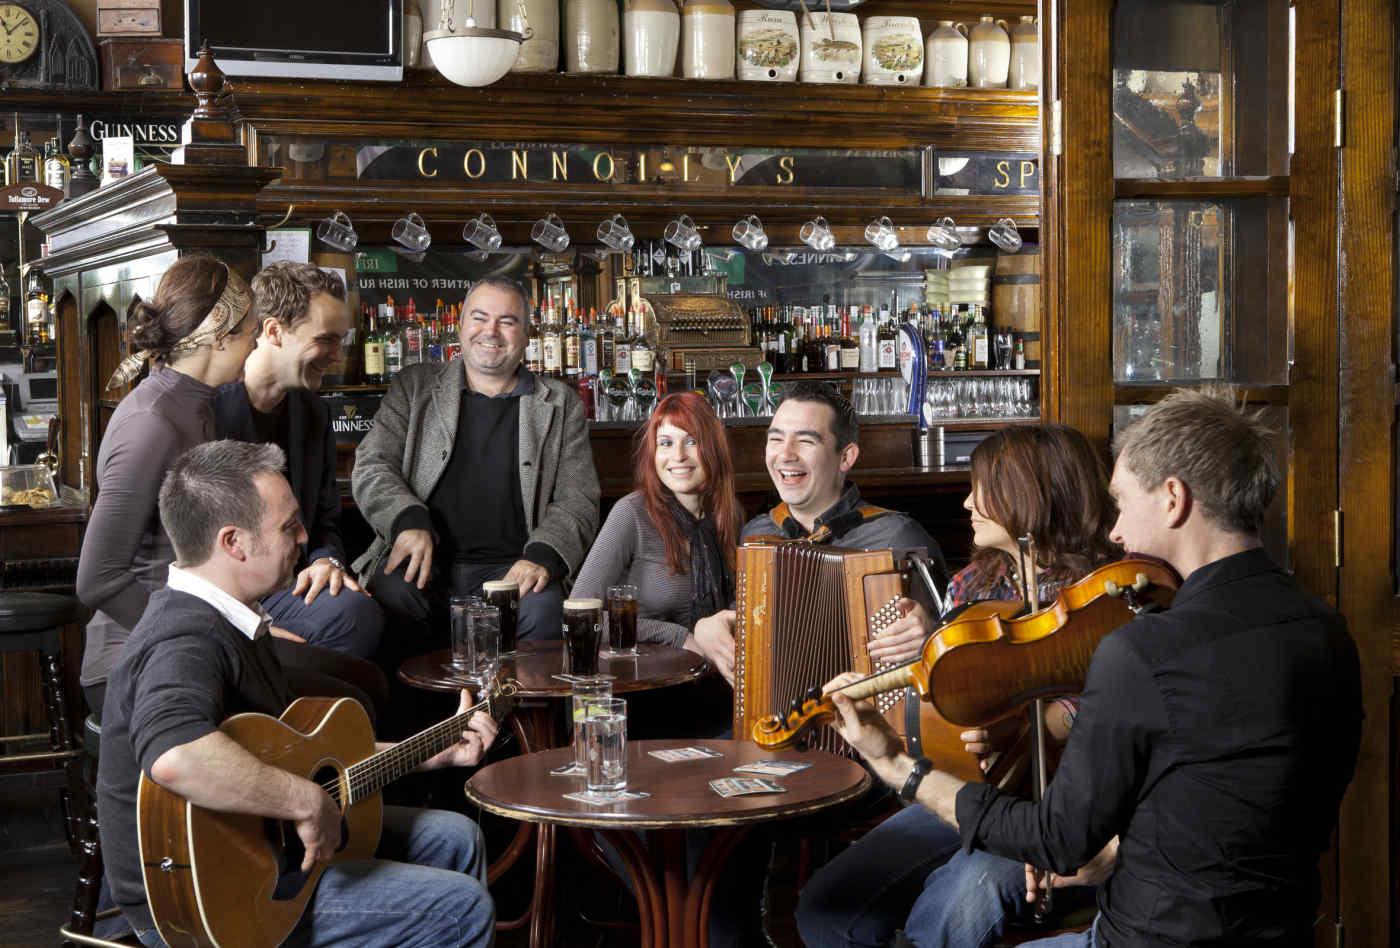 Traditional Irish pub music